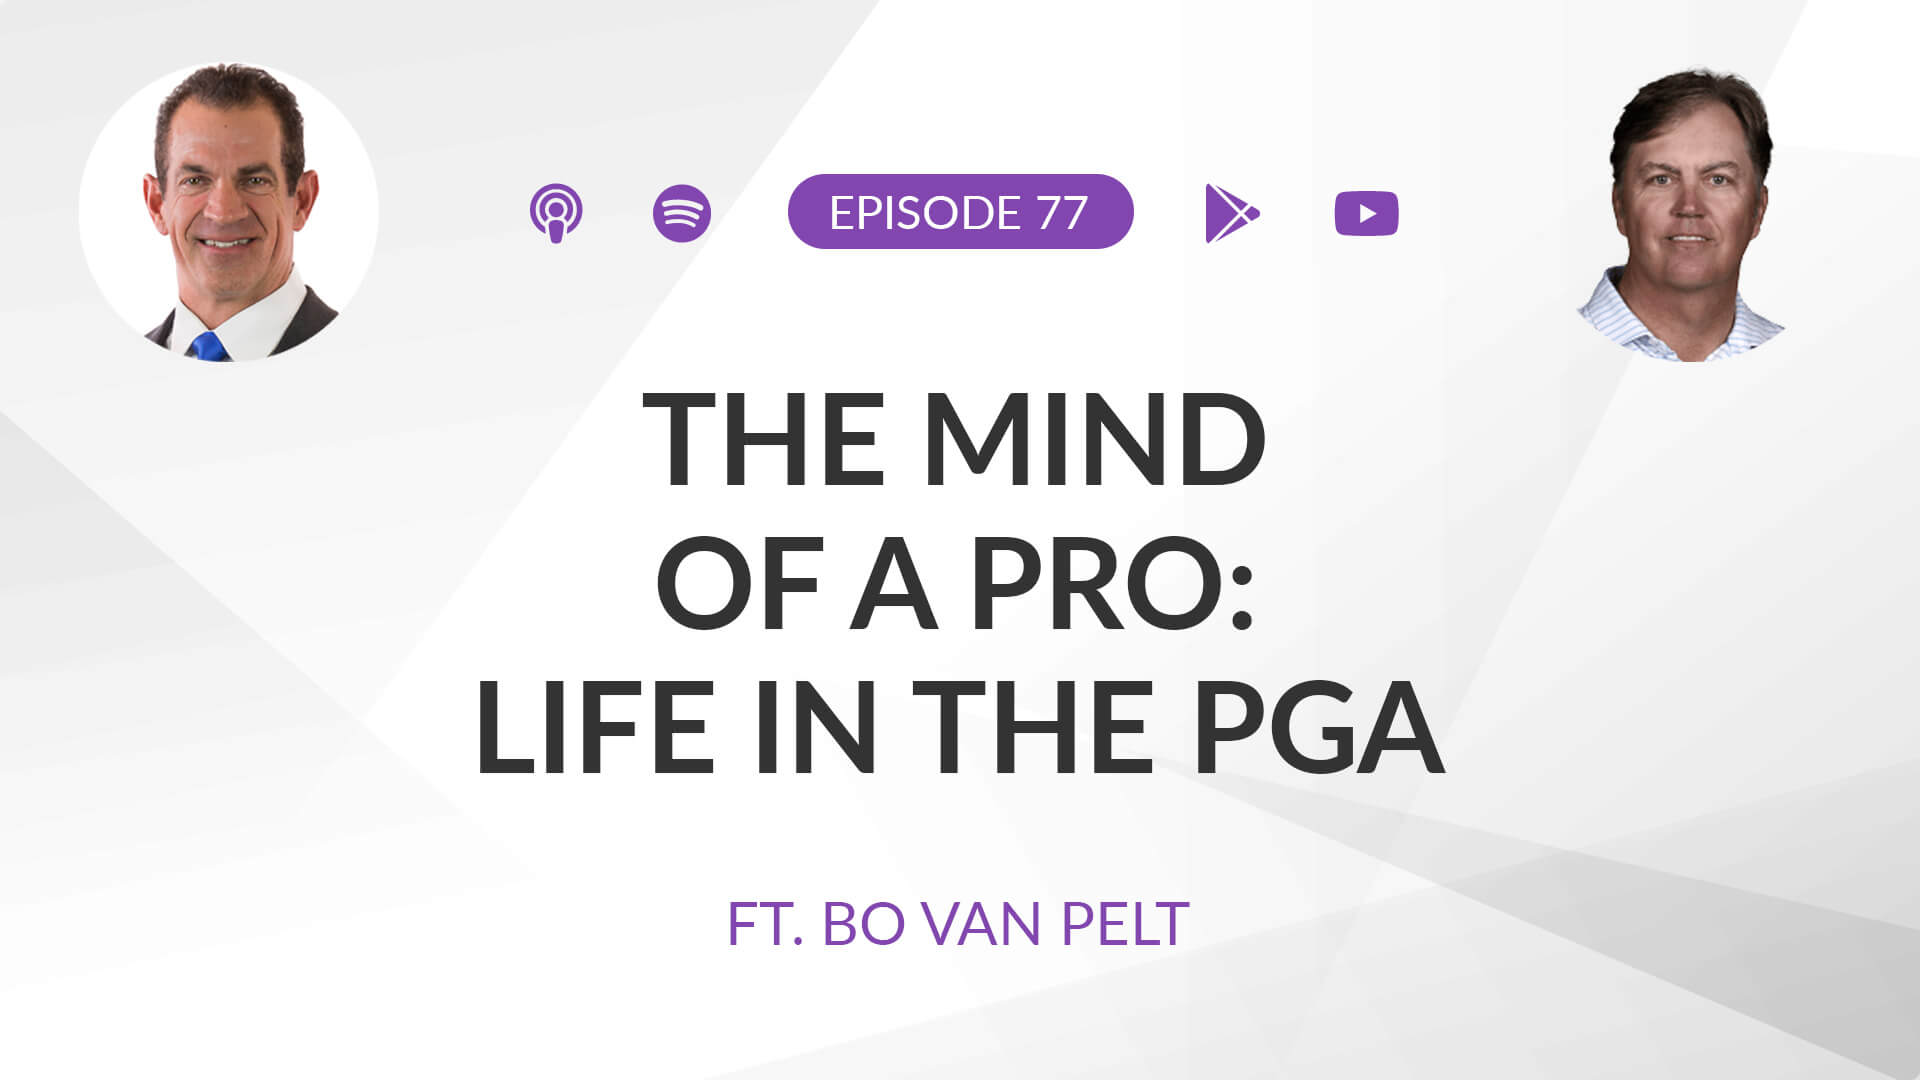 Ep 77: The Mind of a Pro: Life in the PGA ft. Bo Van Pelt